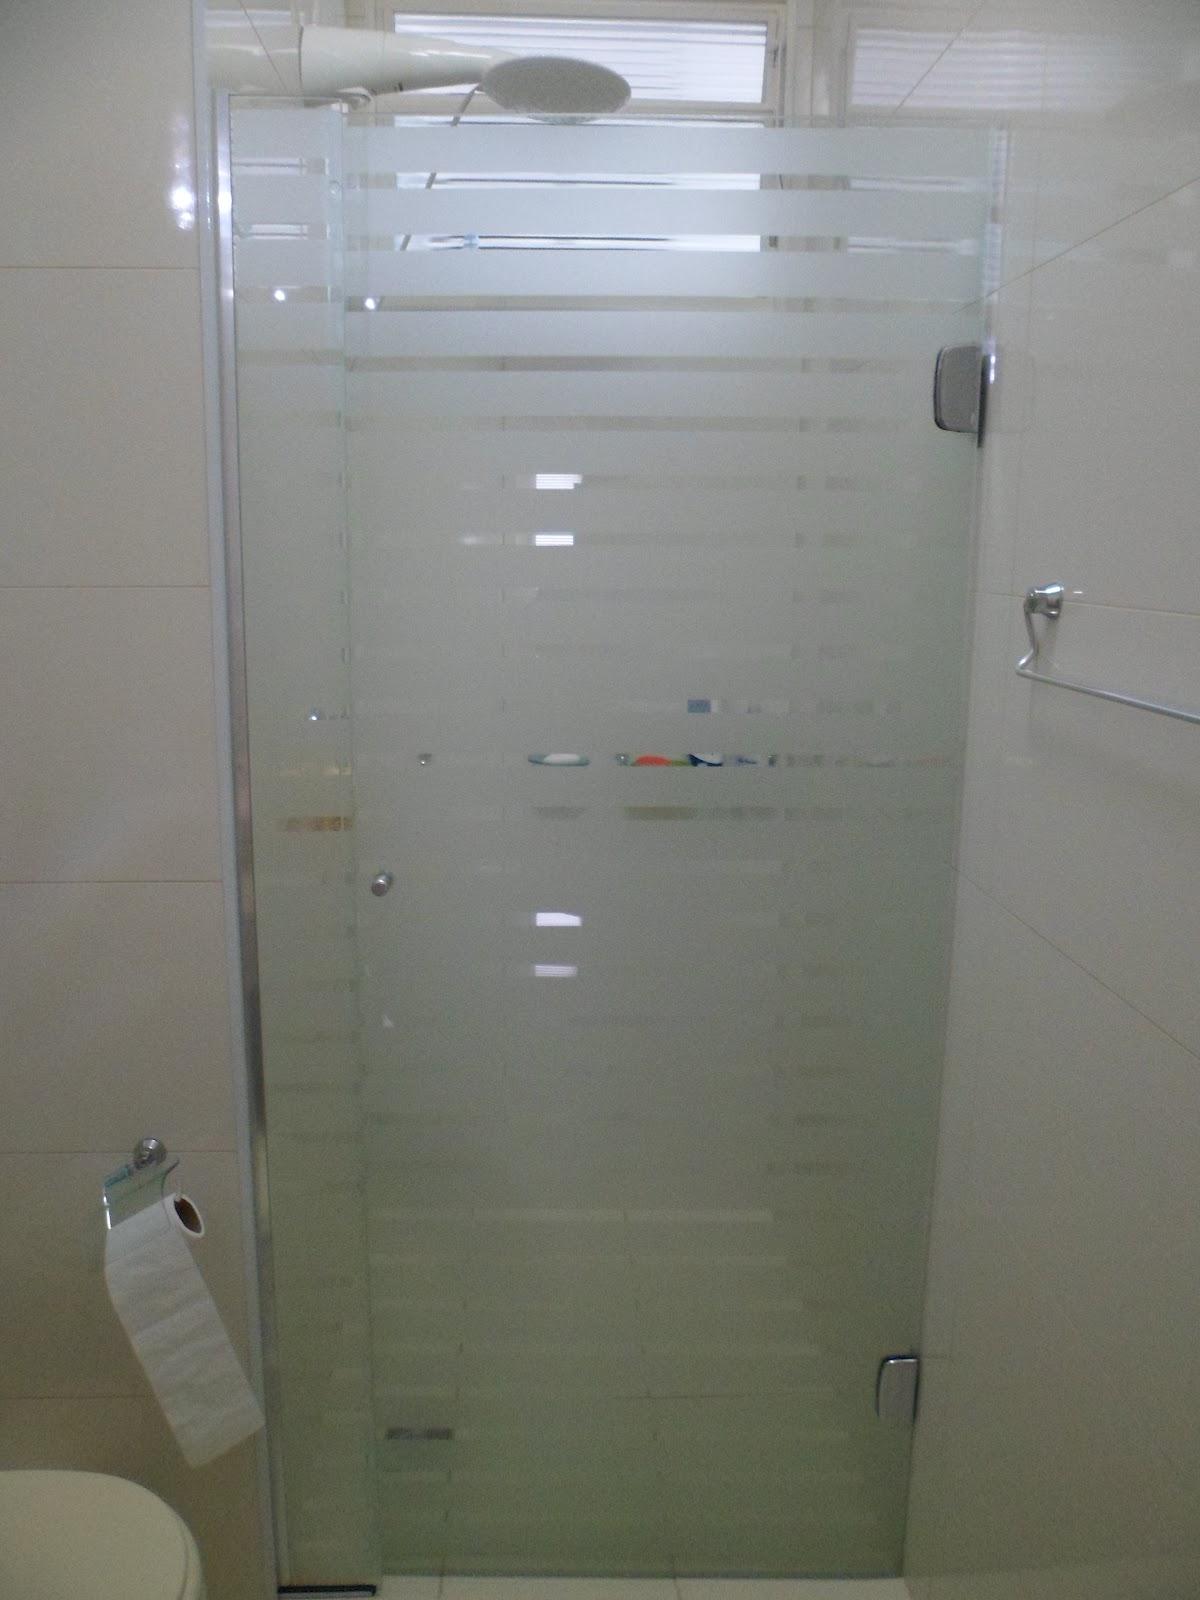 Imagens de #536078 GARAGE 75 ADESIVOS: Adesivo decorativo box banheiro/Jateado/ Bauru 1200x1600 px 3090 Box Banheiro Bauru